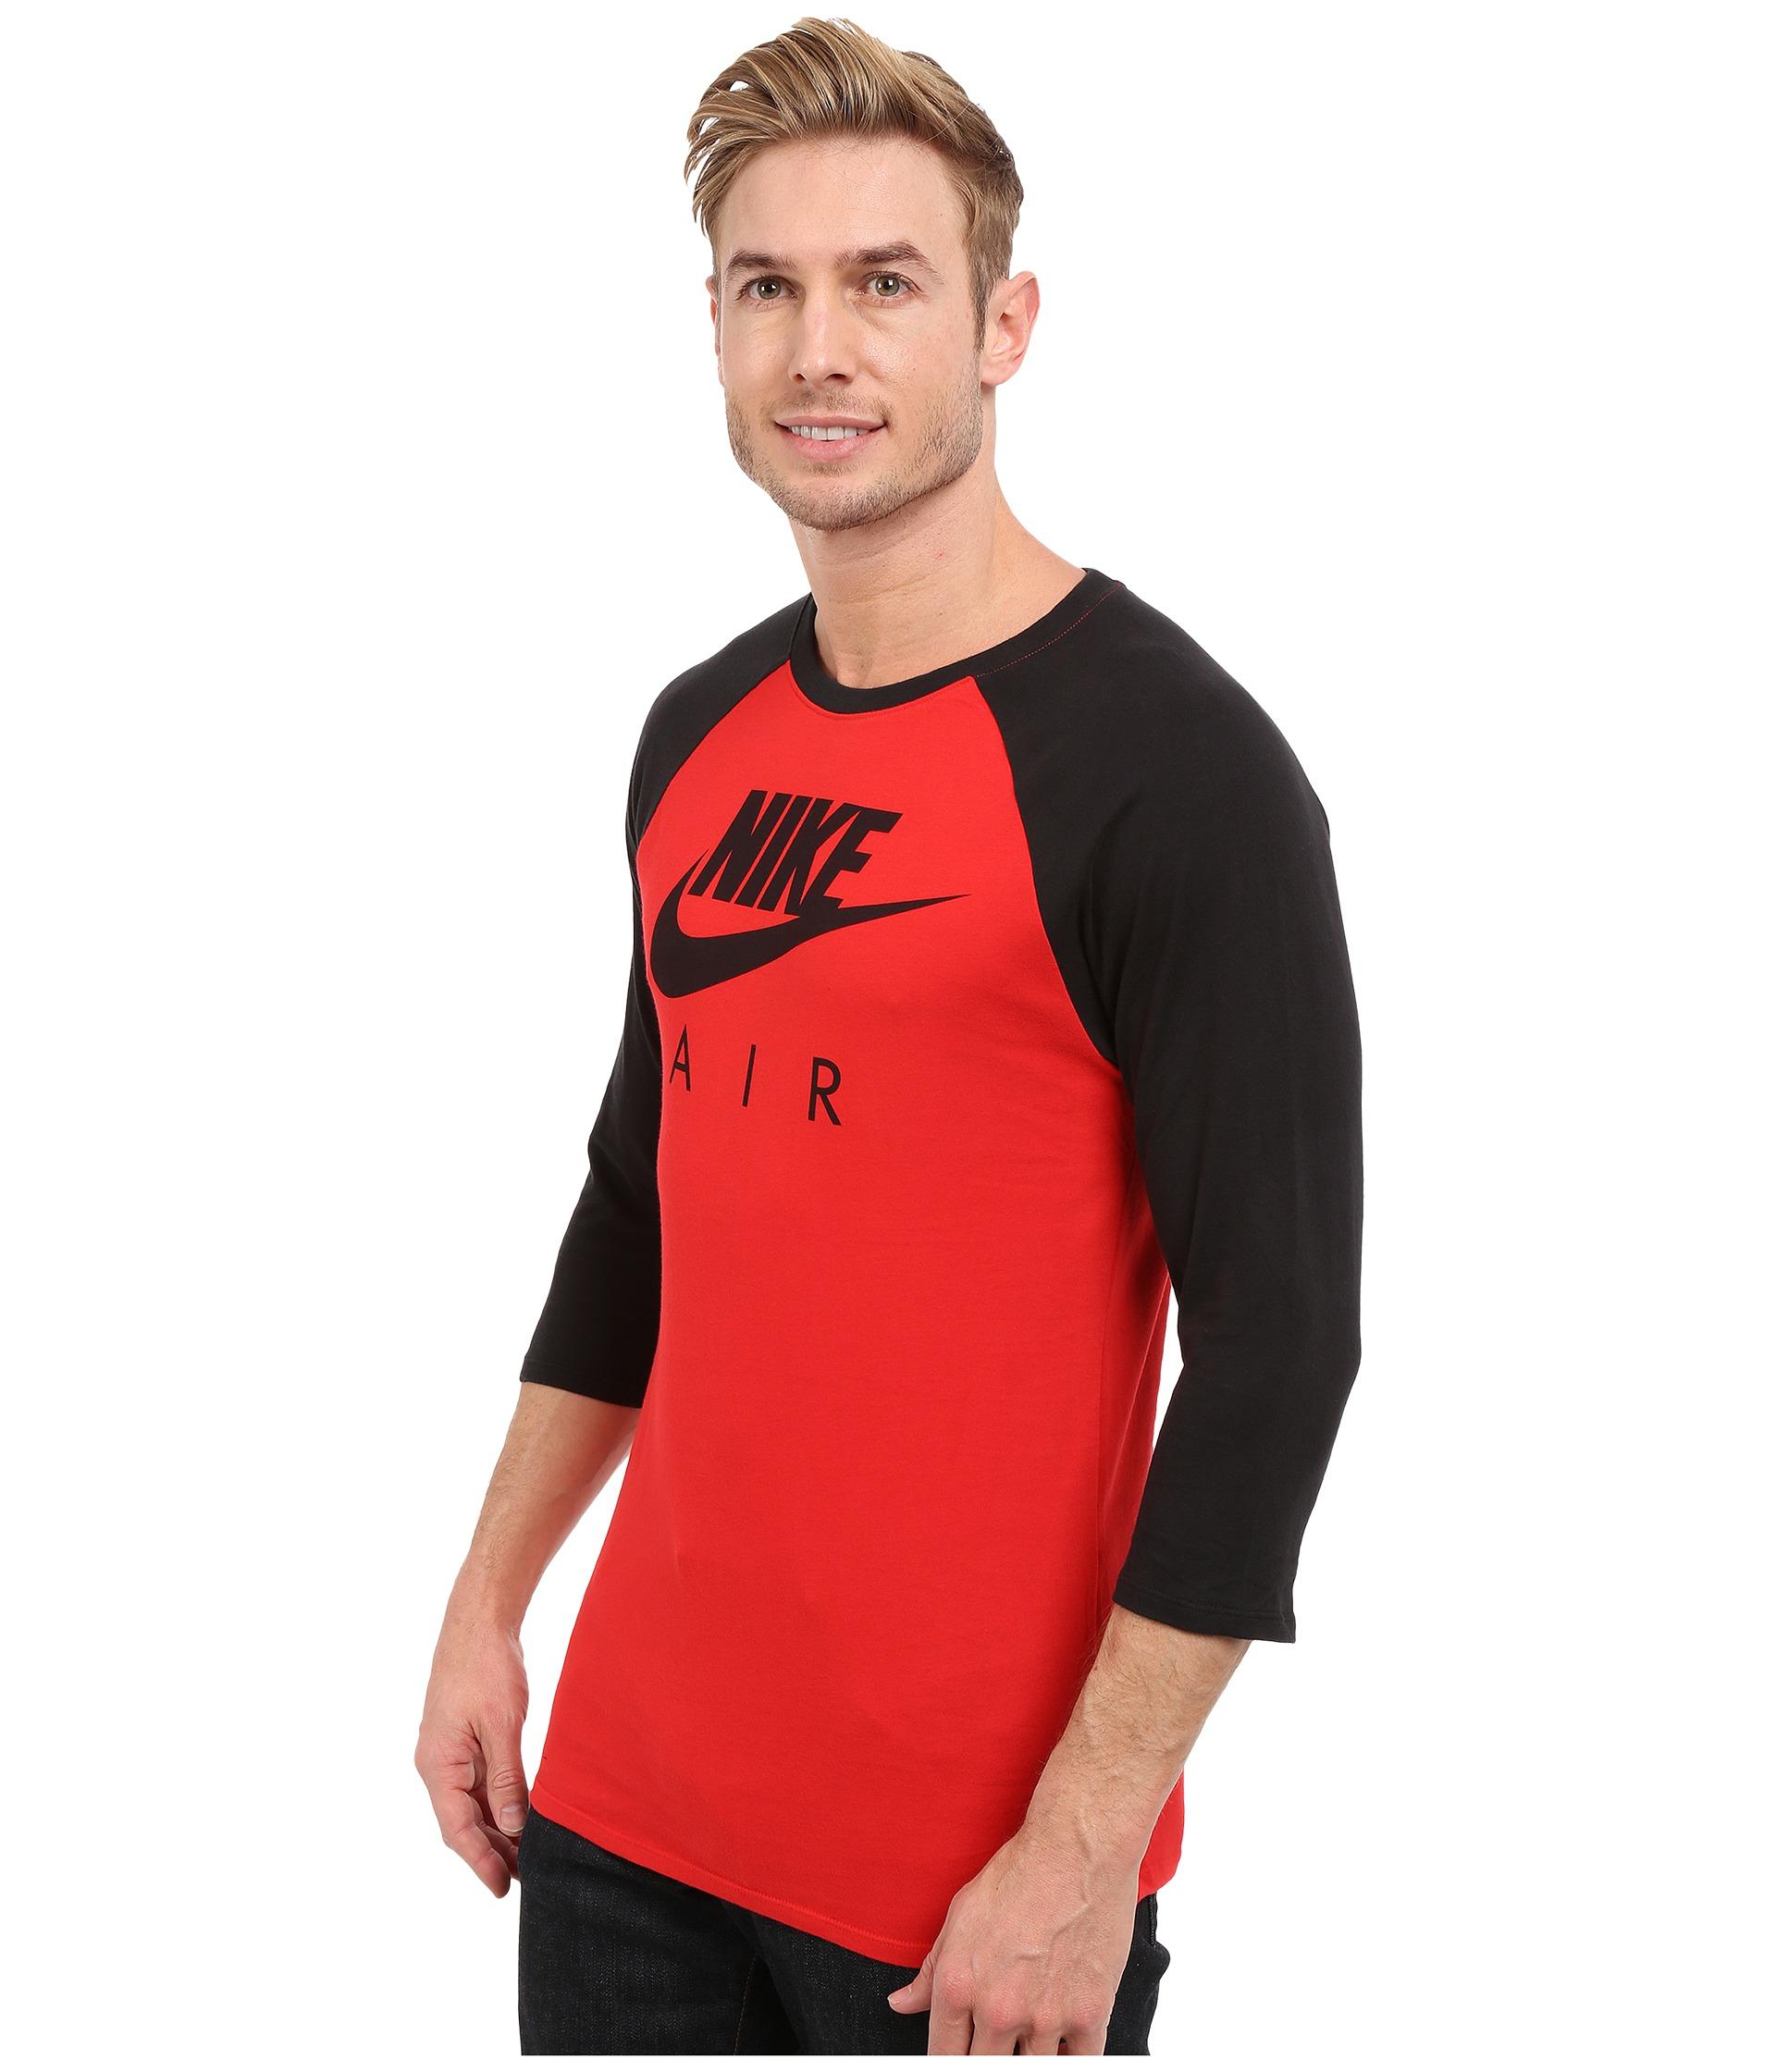 e06b60b2 Nike Air 3/4 Raglan Tee in Red for Men - Lyst